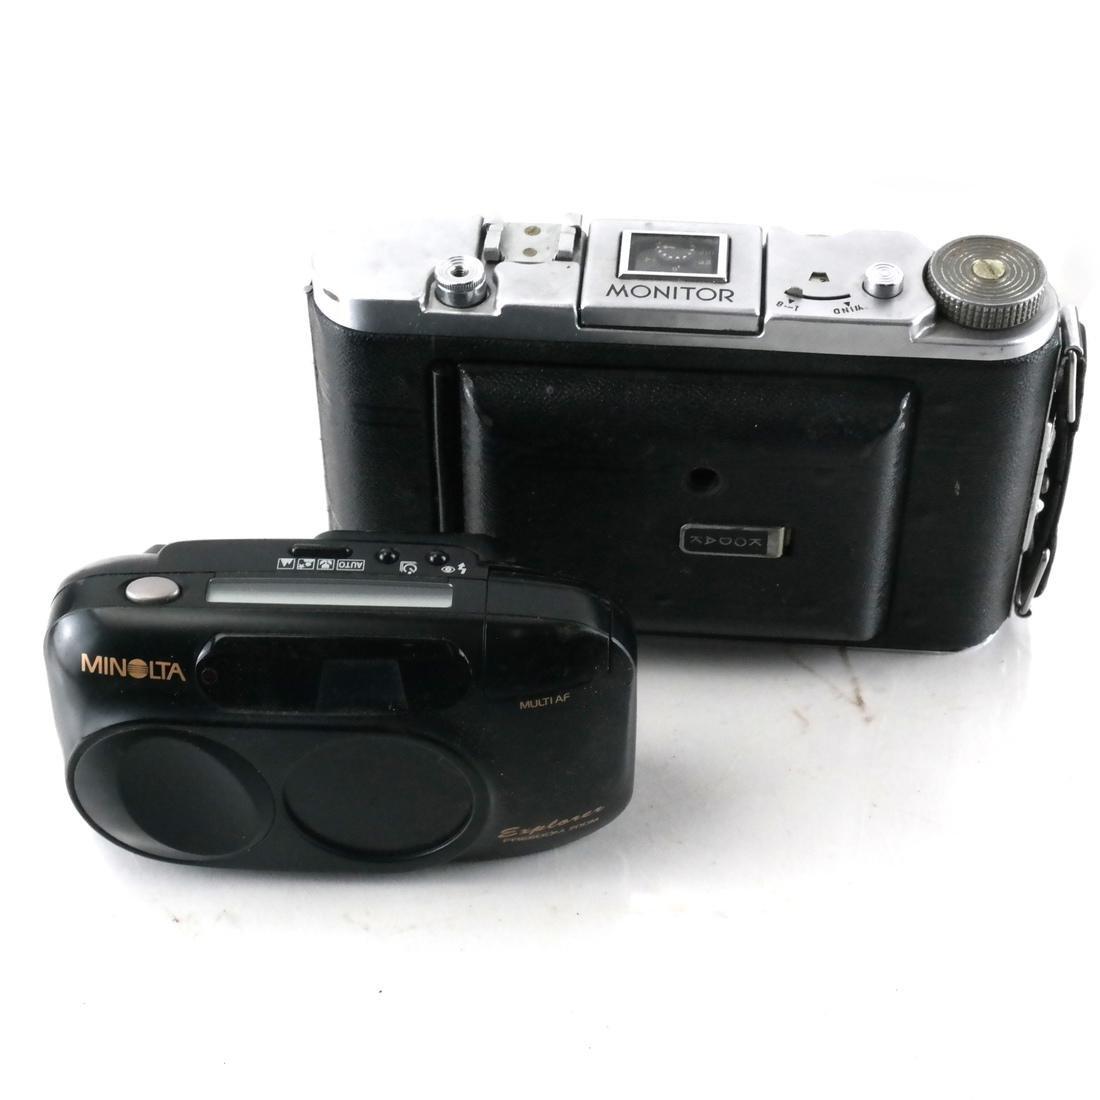 Lot of Camera Equipment - 4